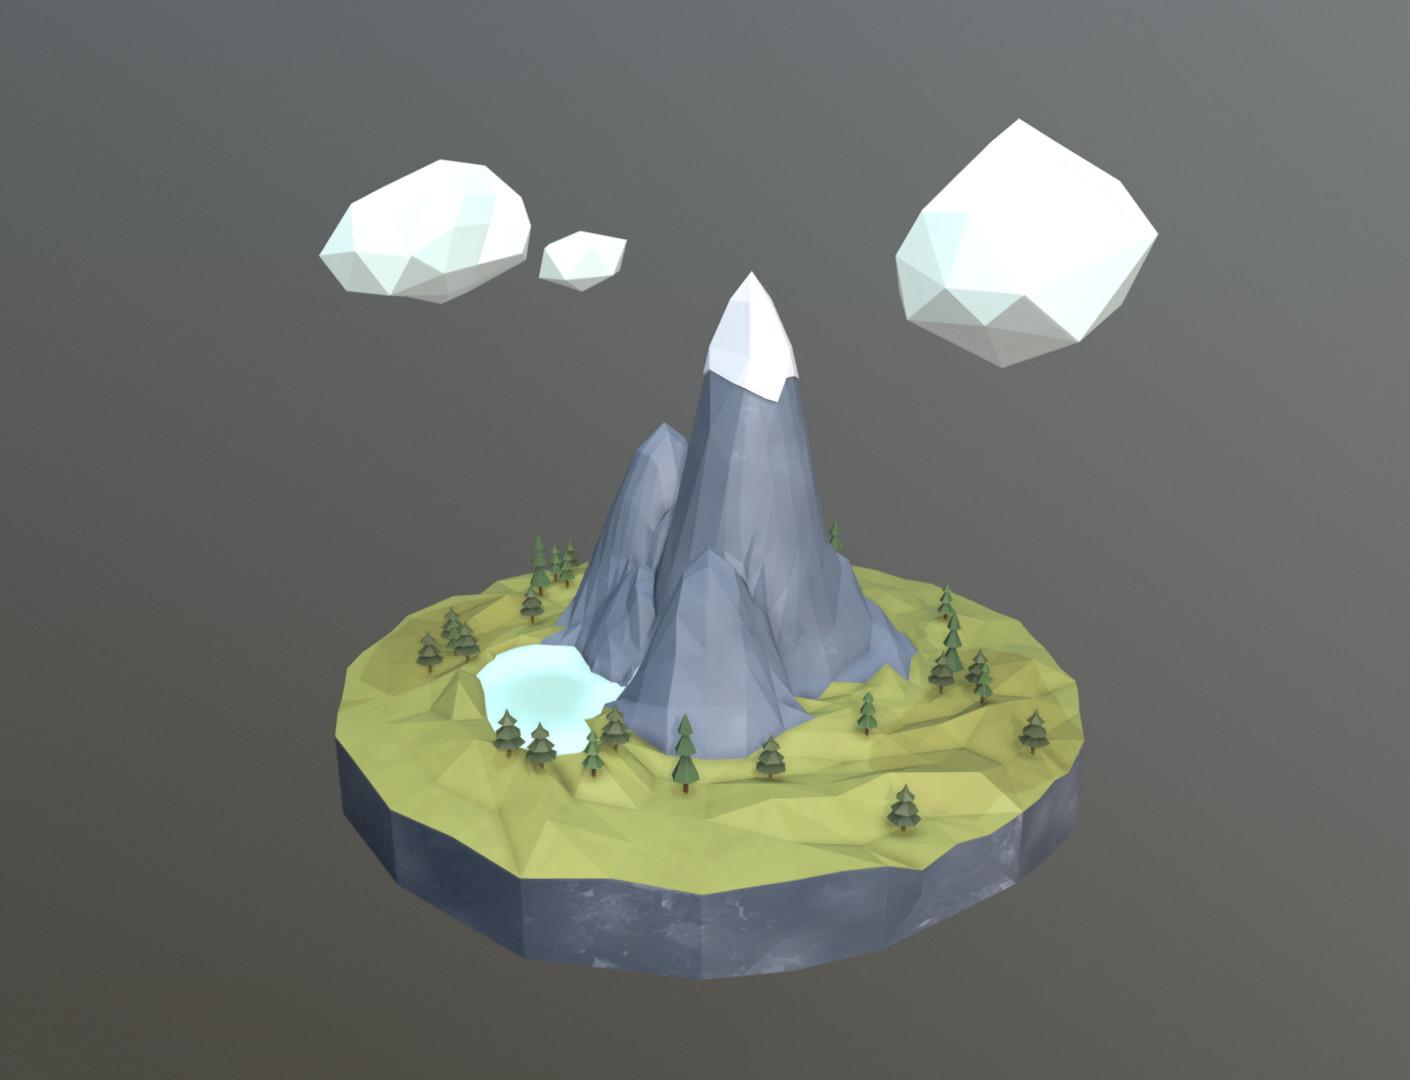 Screenshot of the model inside Sketchfab.